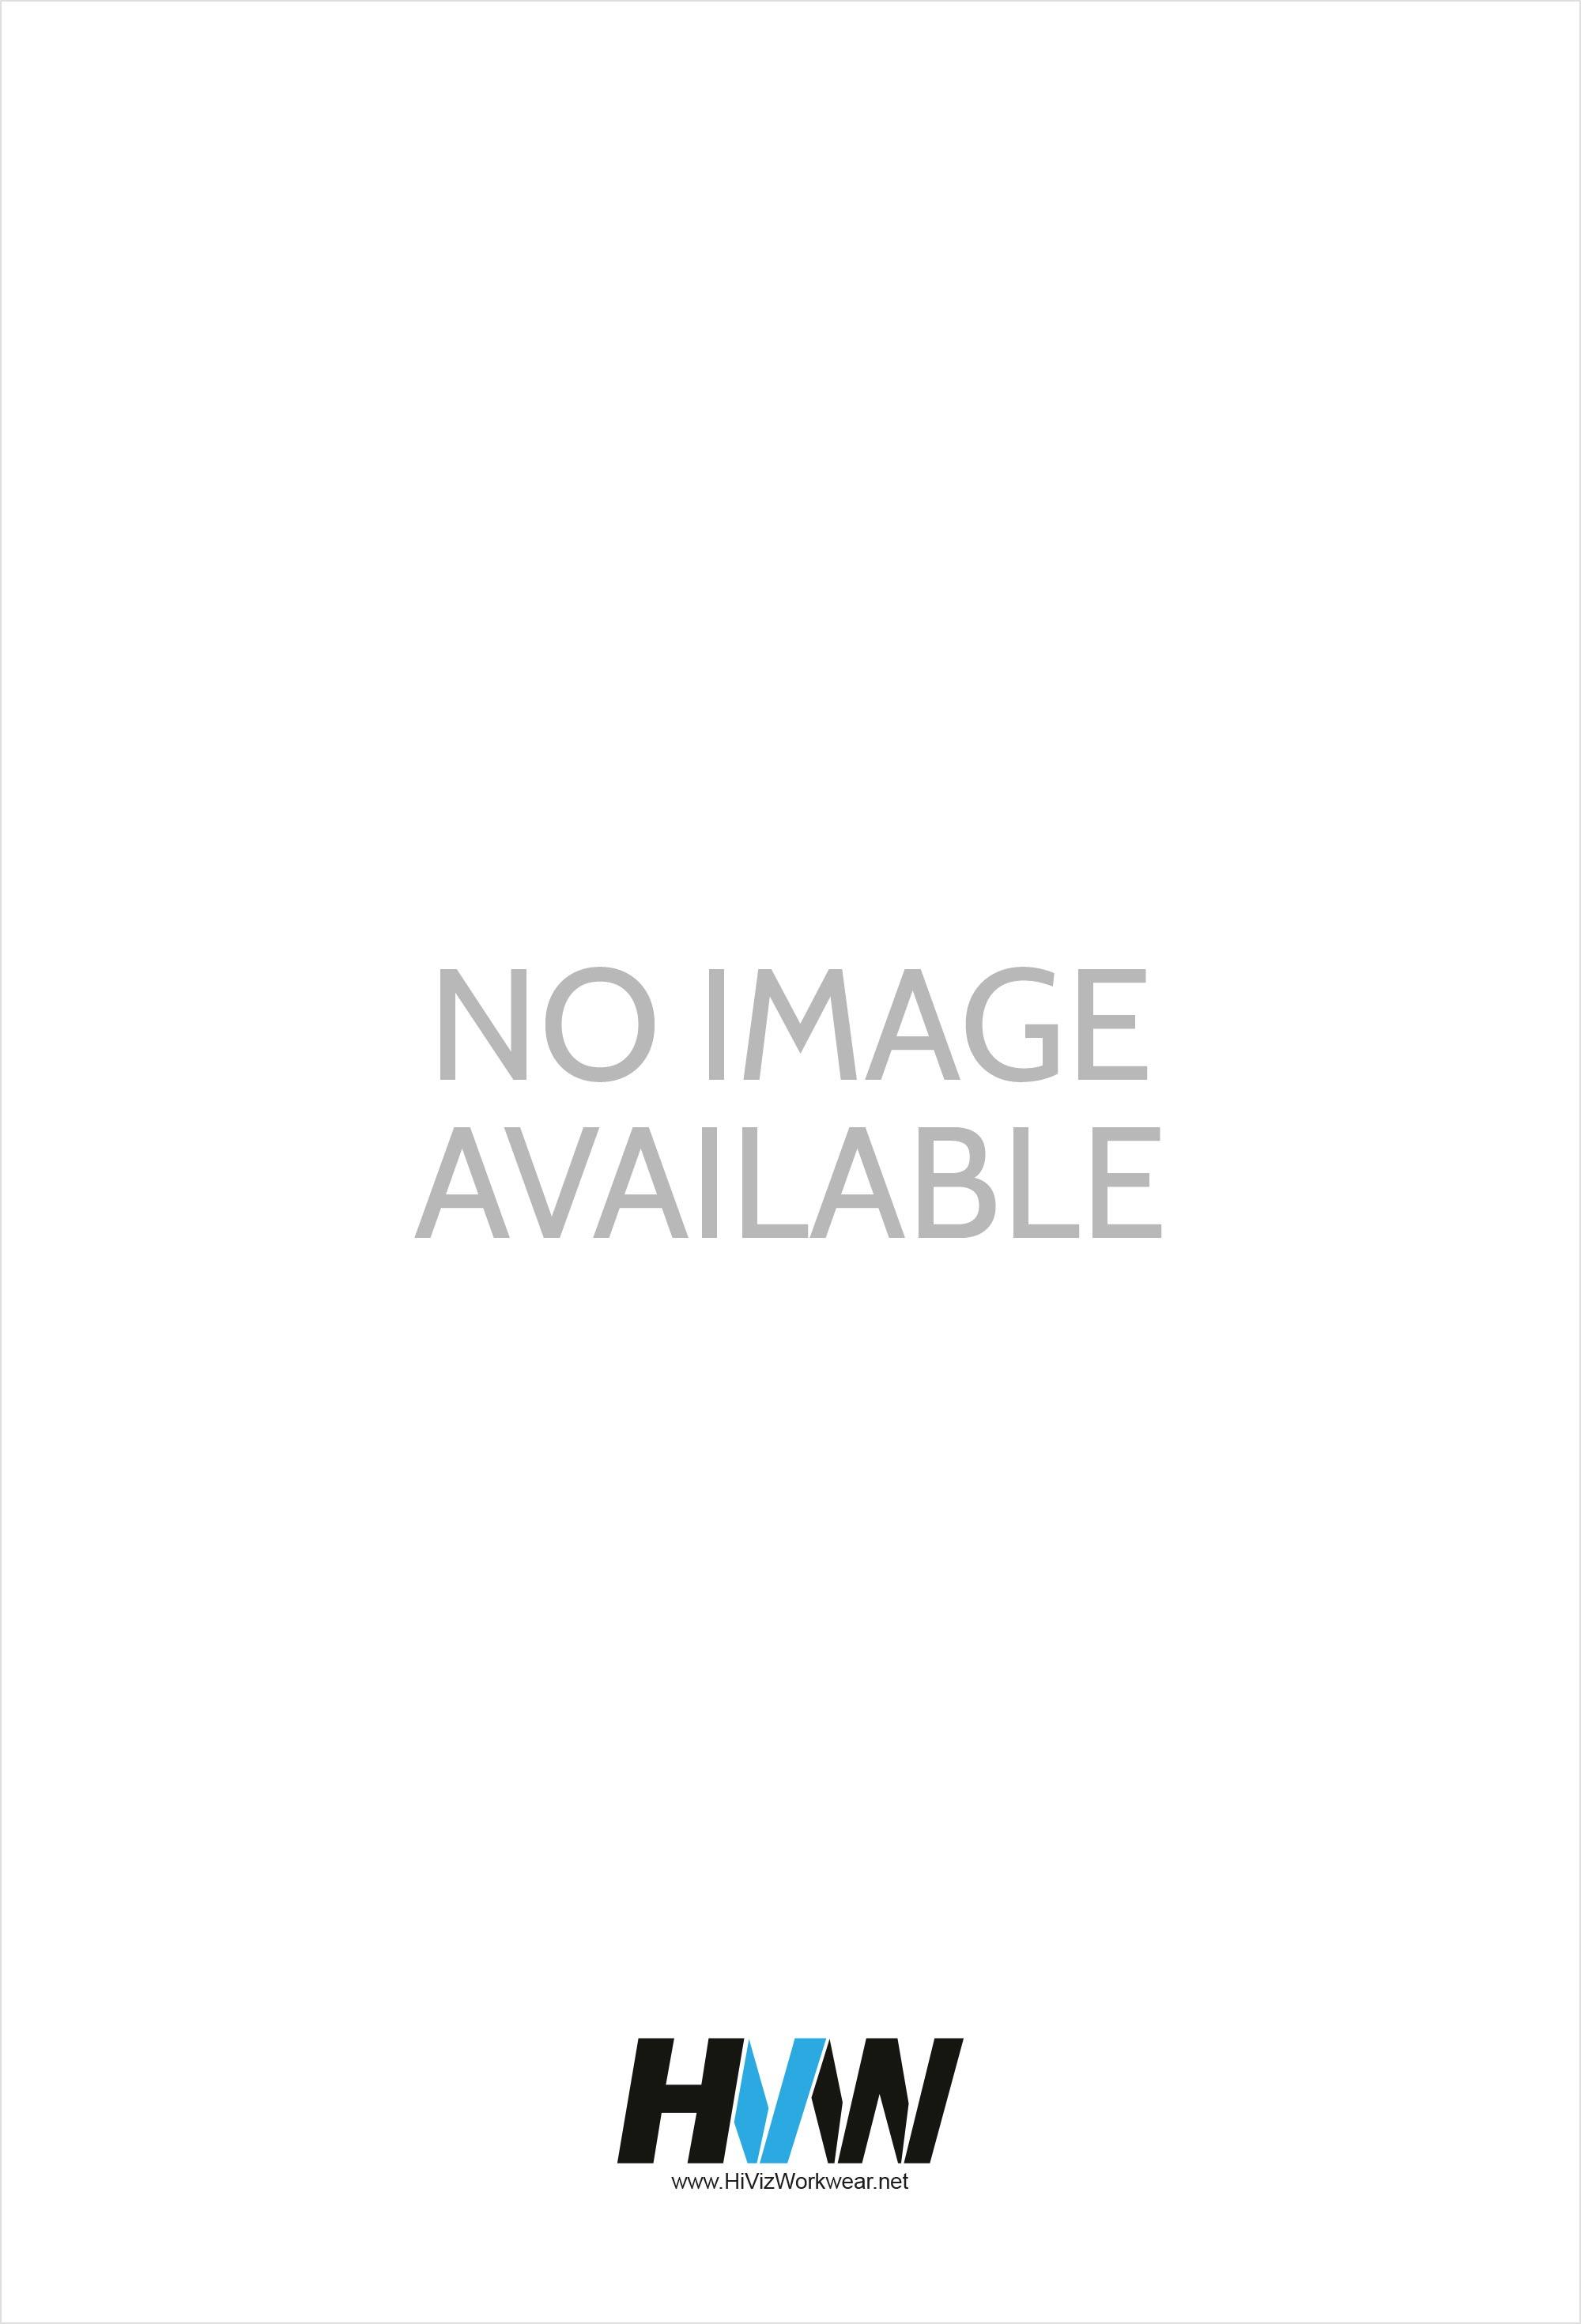 PR212 Short Sleeve Pilot Shirt  (Collar Size 14.5 To 19.0)